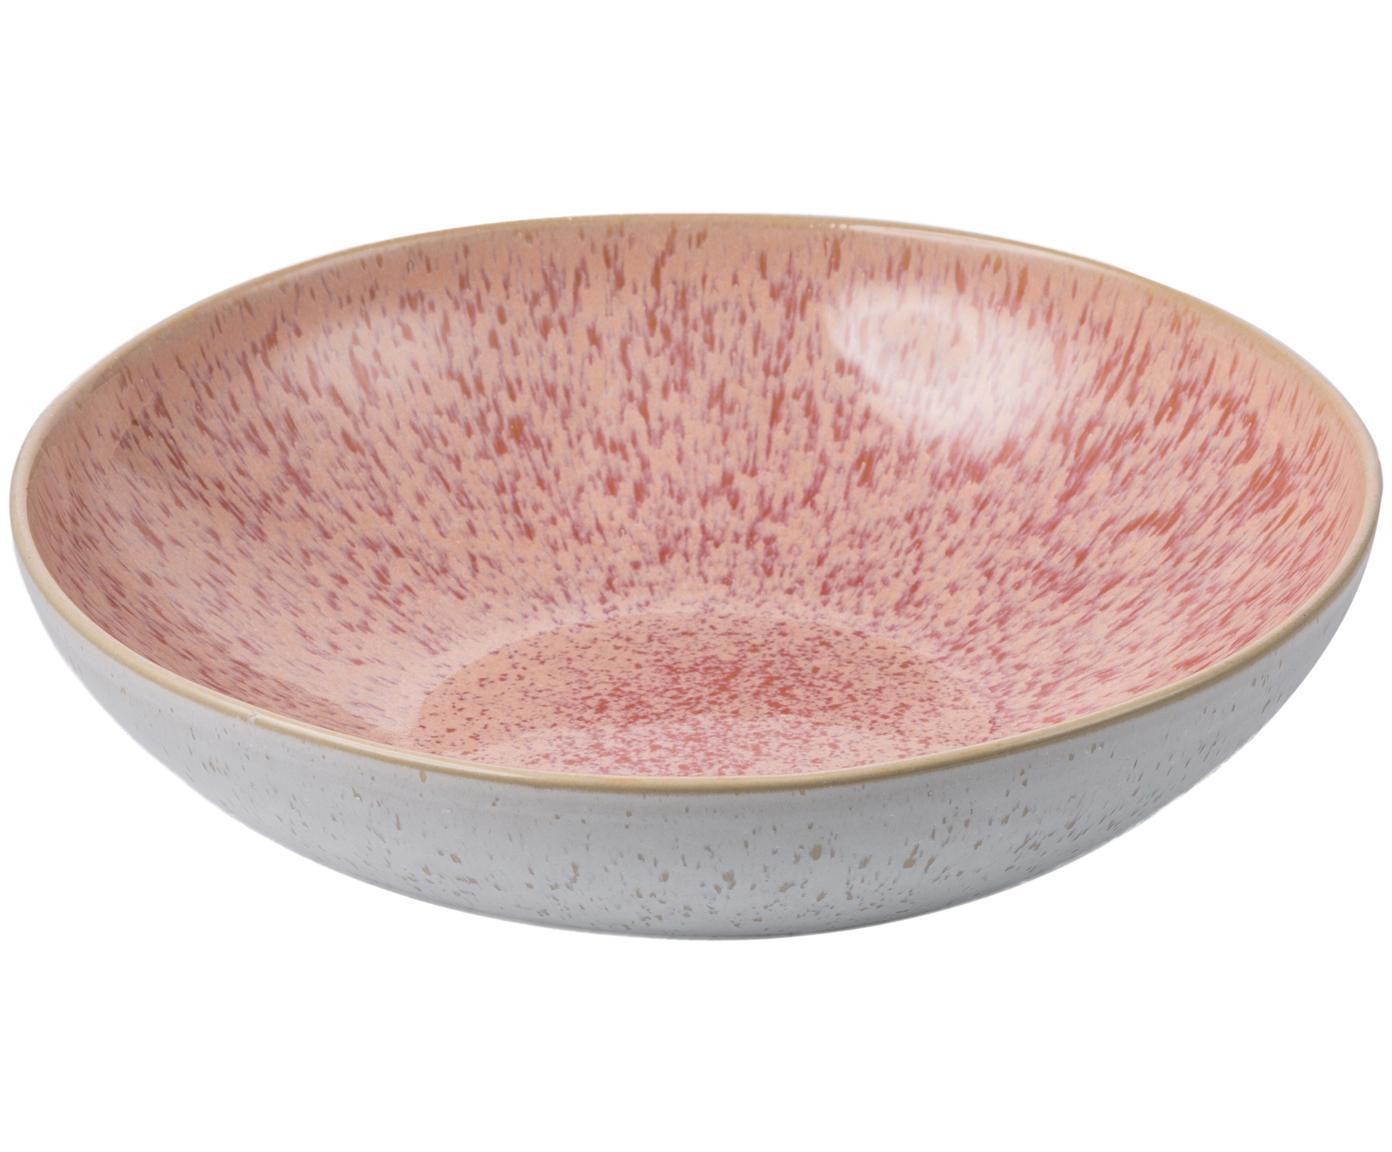 Bol pintadoamano Areia, Gres, Tonos rojos, blanco crudo, beige claro, Ø 22 x Al 5 cm